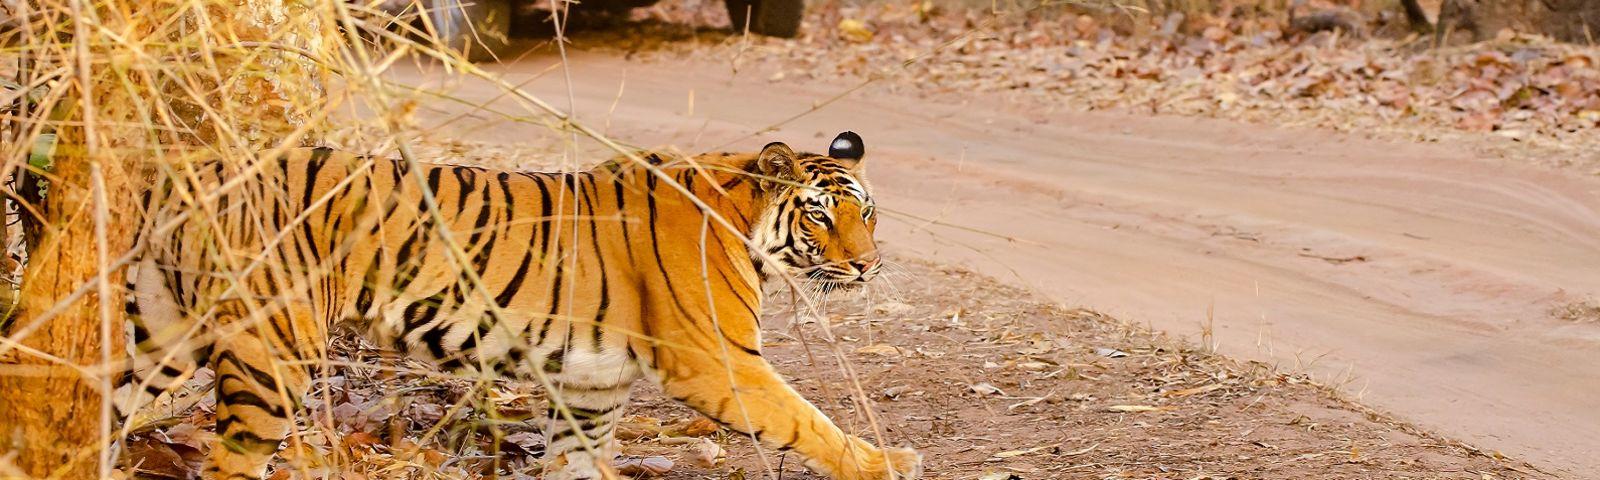 Enchanting Travels - Tiger Safaris in India - A tiger crossing the safari track inside bandhavgarh tiger reserve during a wildlife